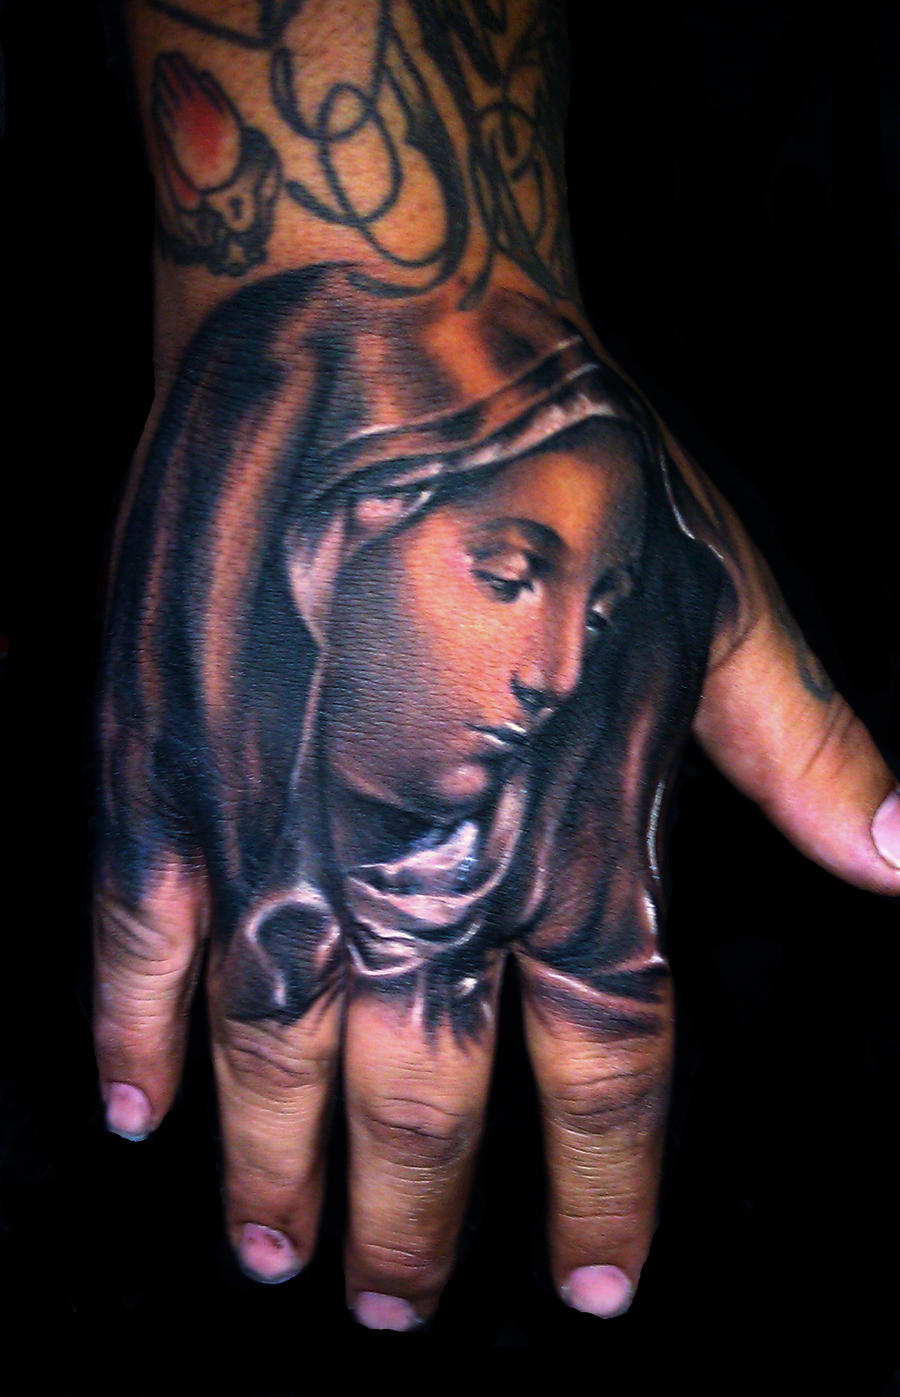 Virgin delorosa hand tattoo by hatefulss